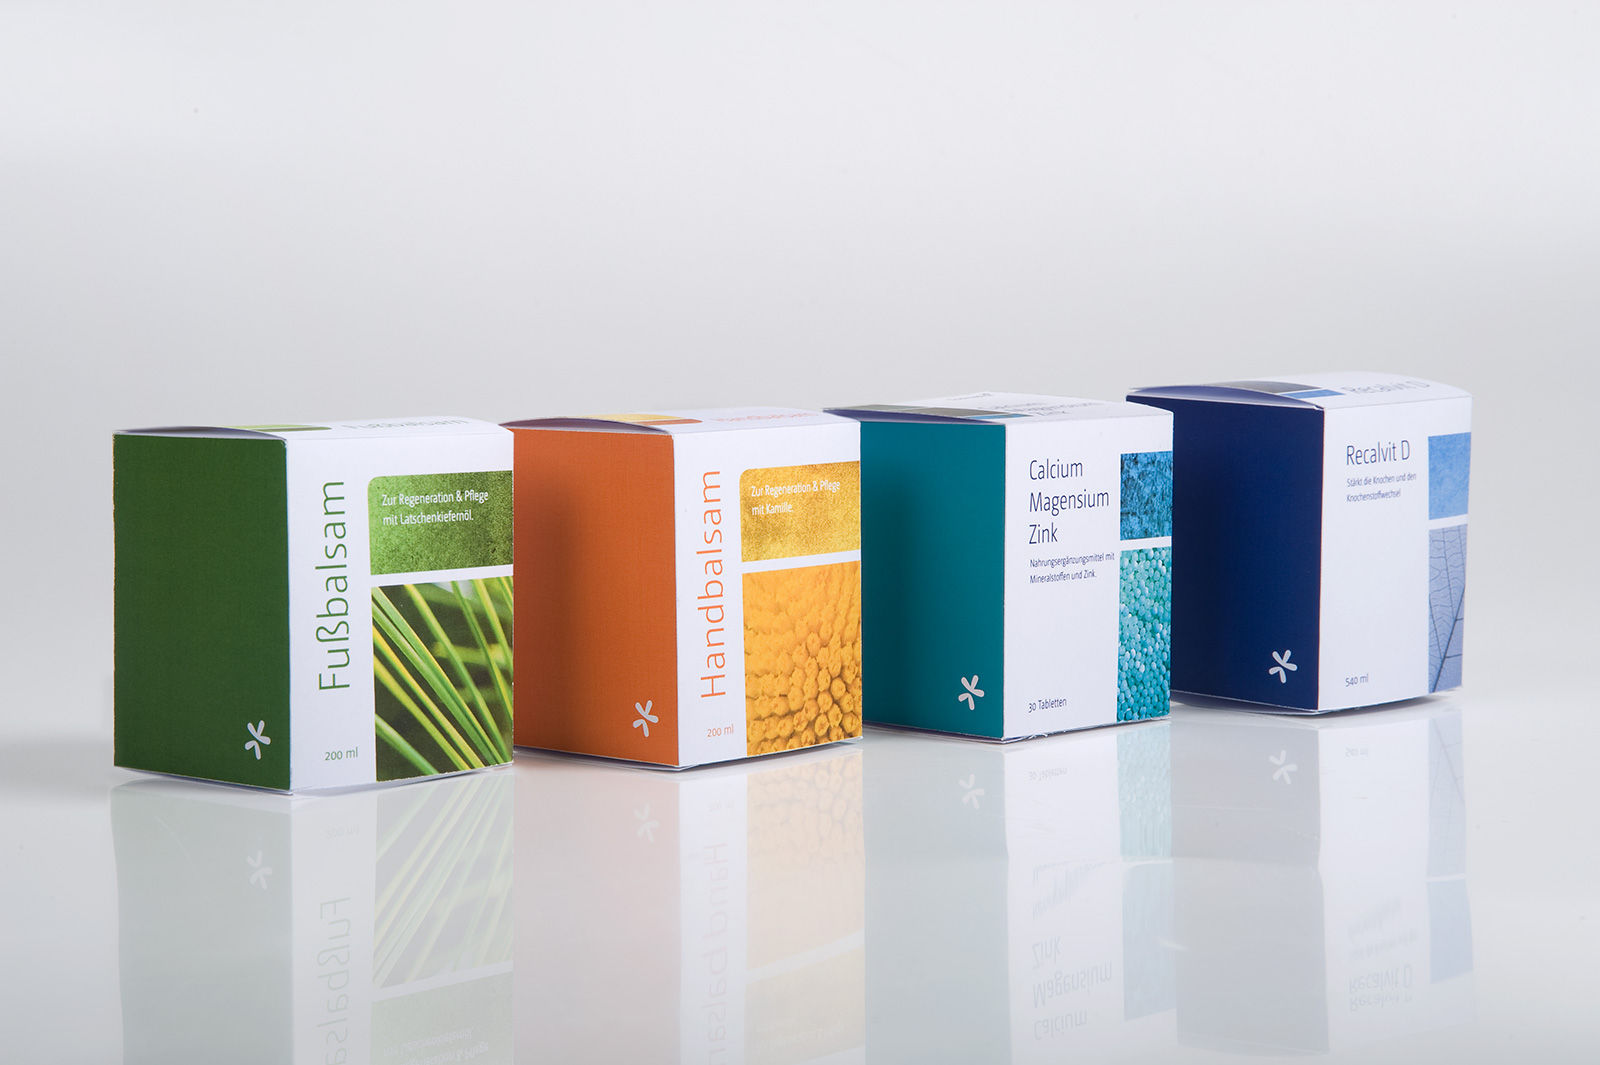 OTC-Verpackungsdesign_duomedica_Nahrungsergänzung